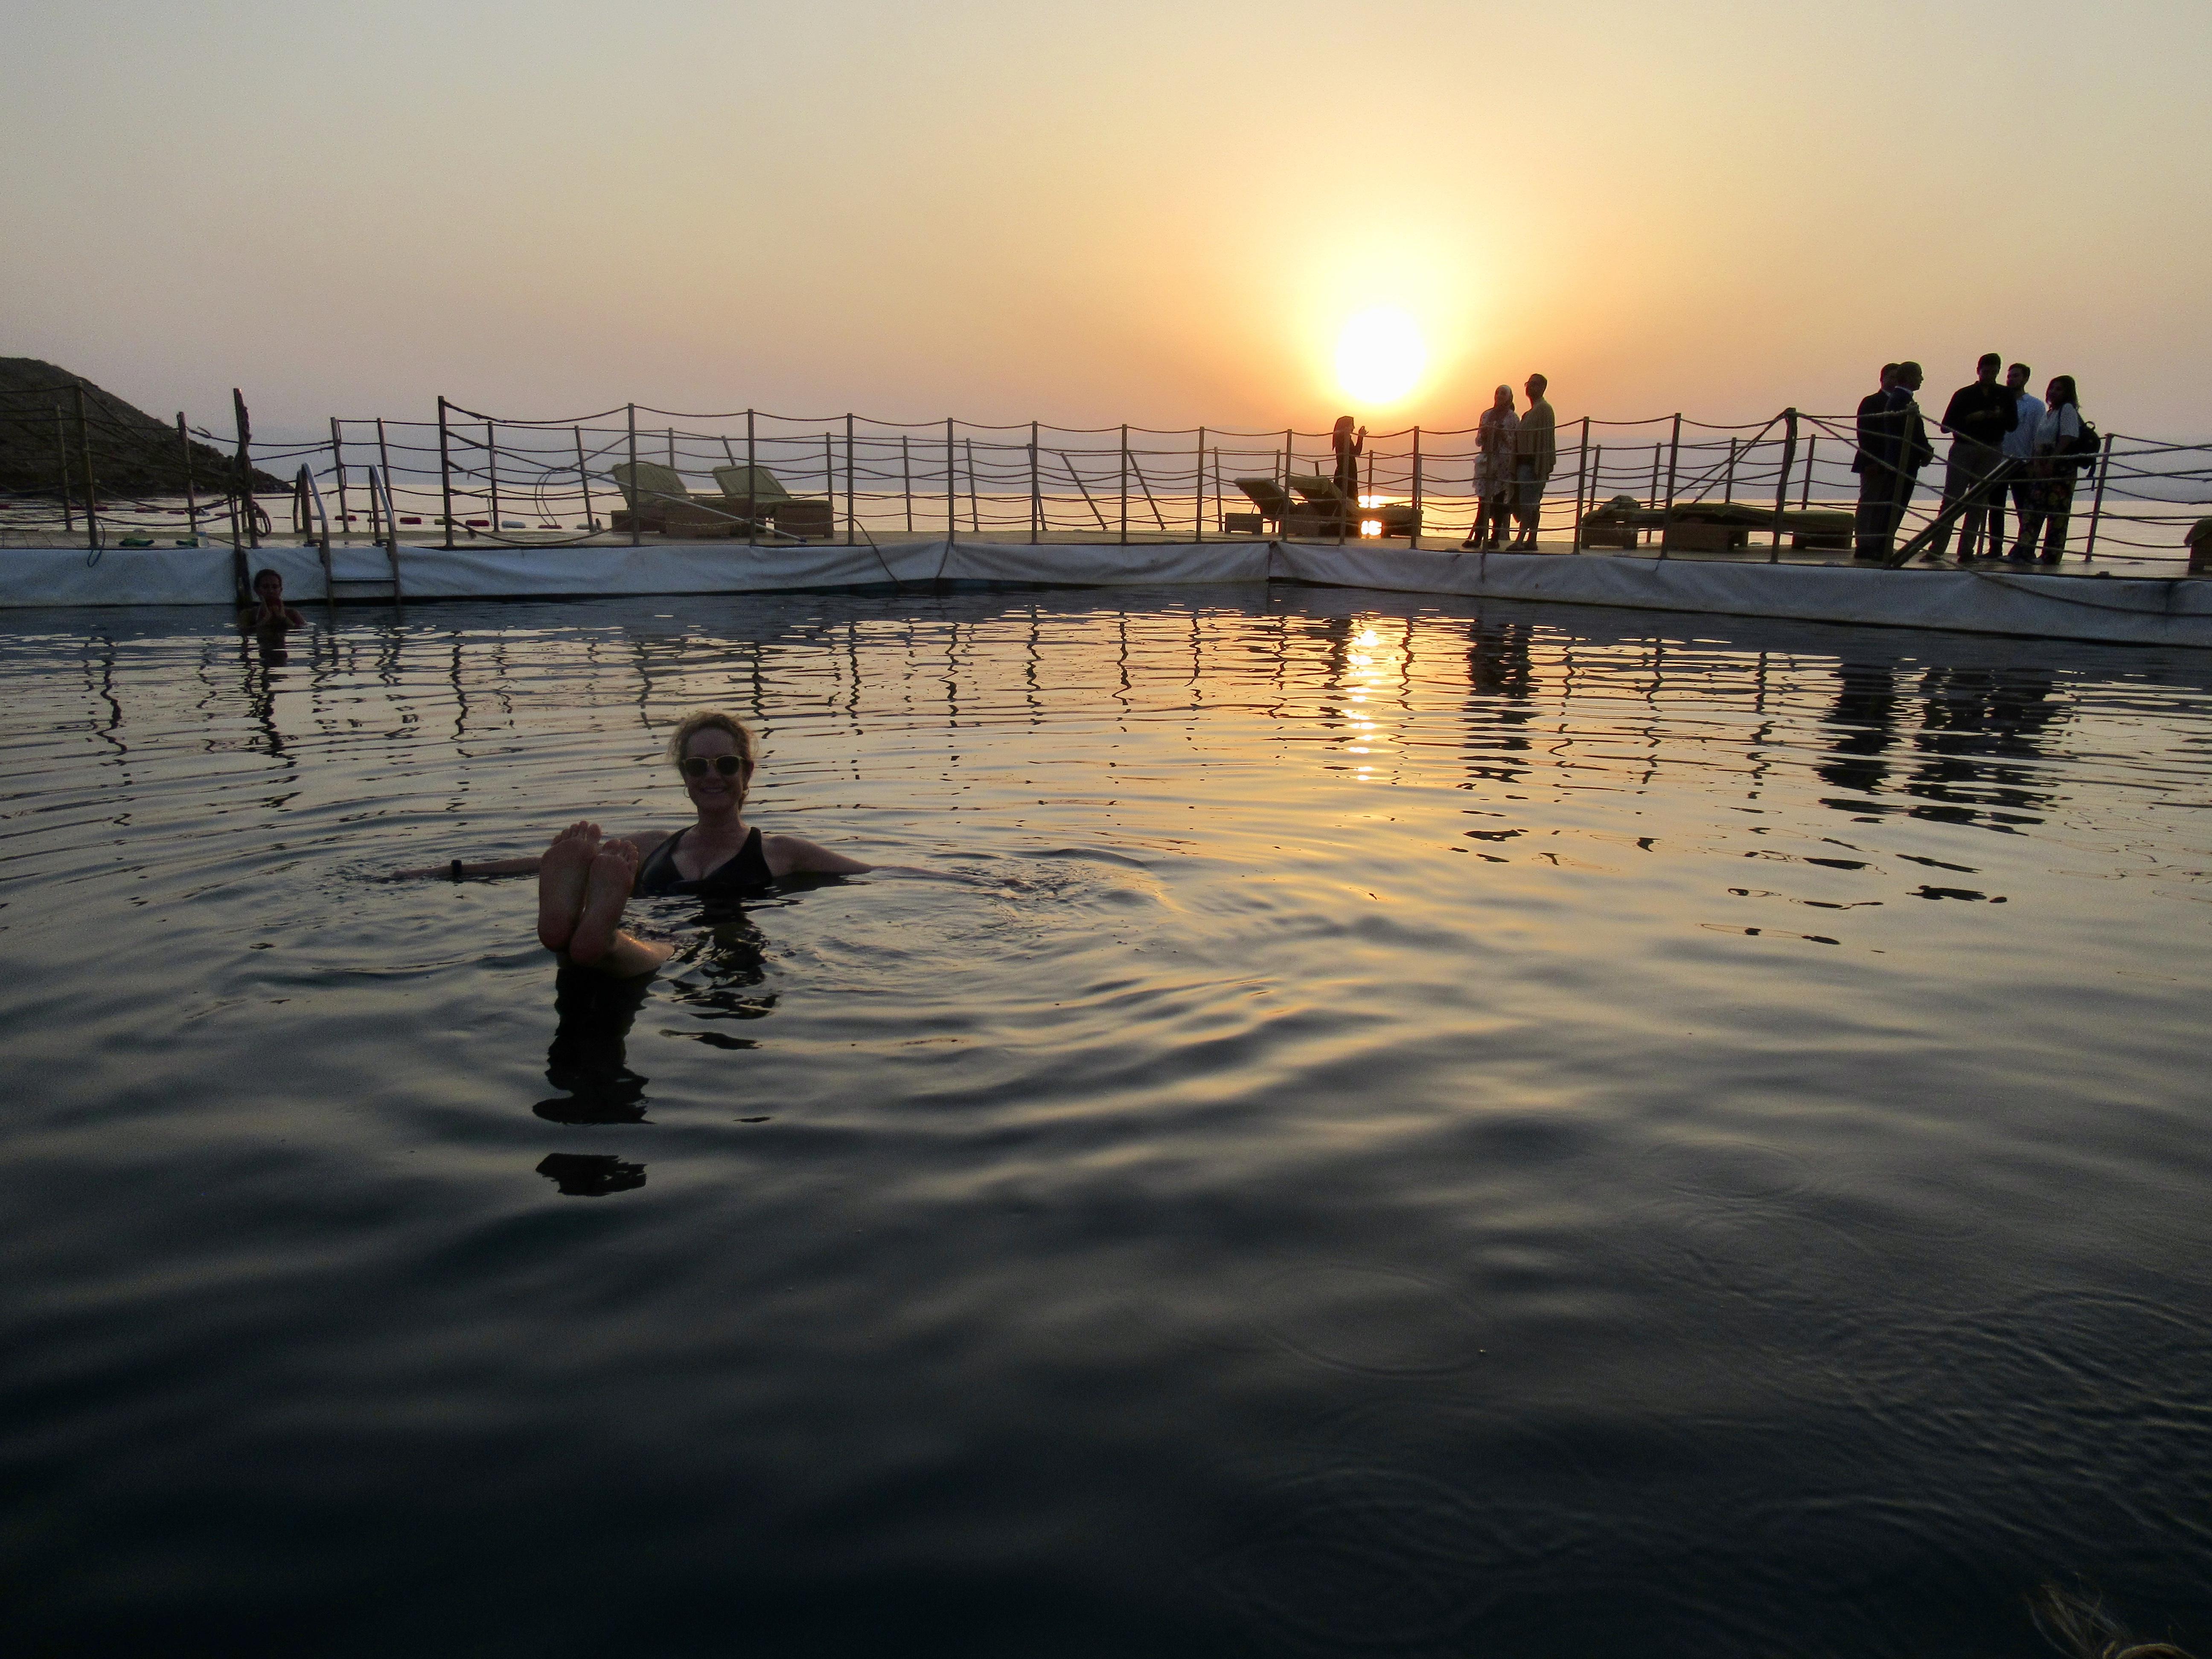 hostilidad Accesorios mediodía  best bed: Hilton Dead Sea Resort, Sweimeh, Jordan – julieabroad